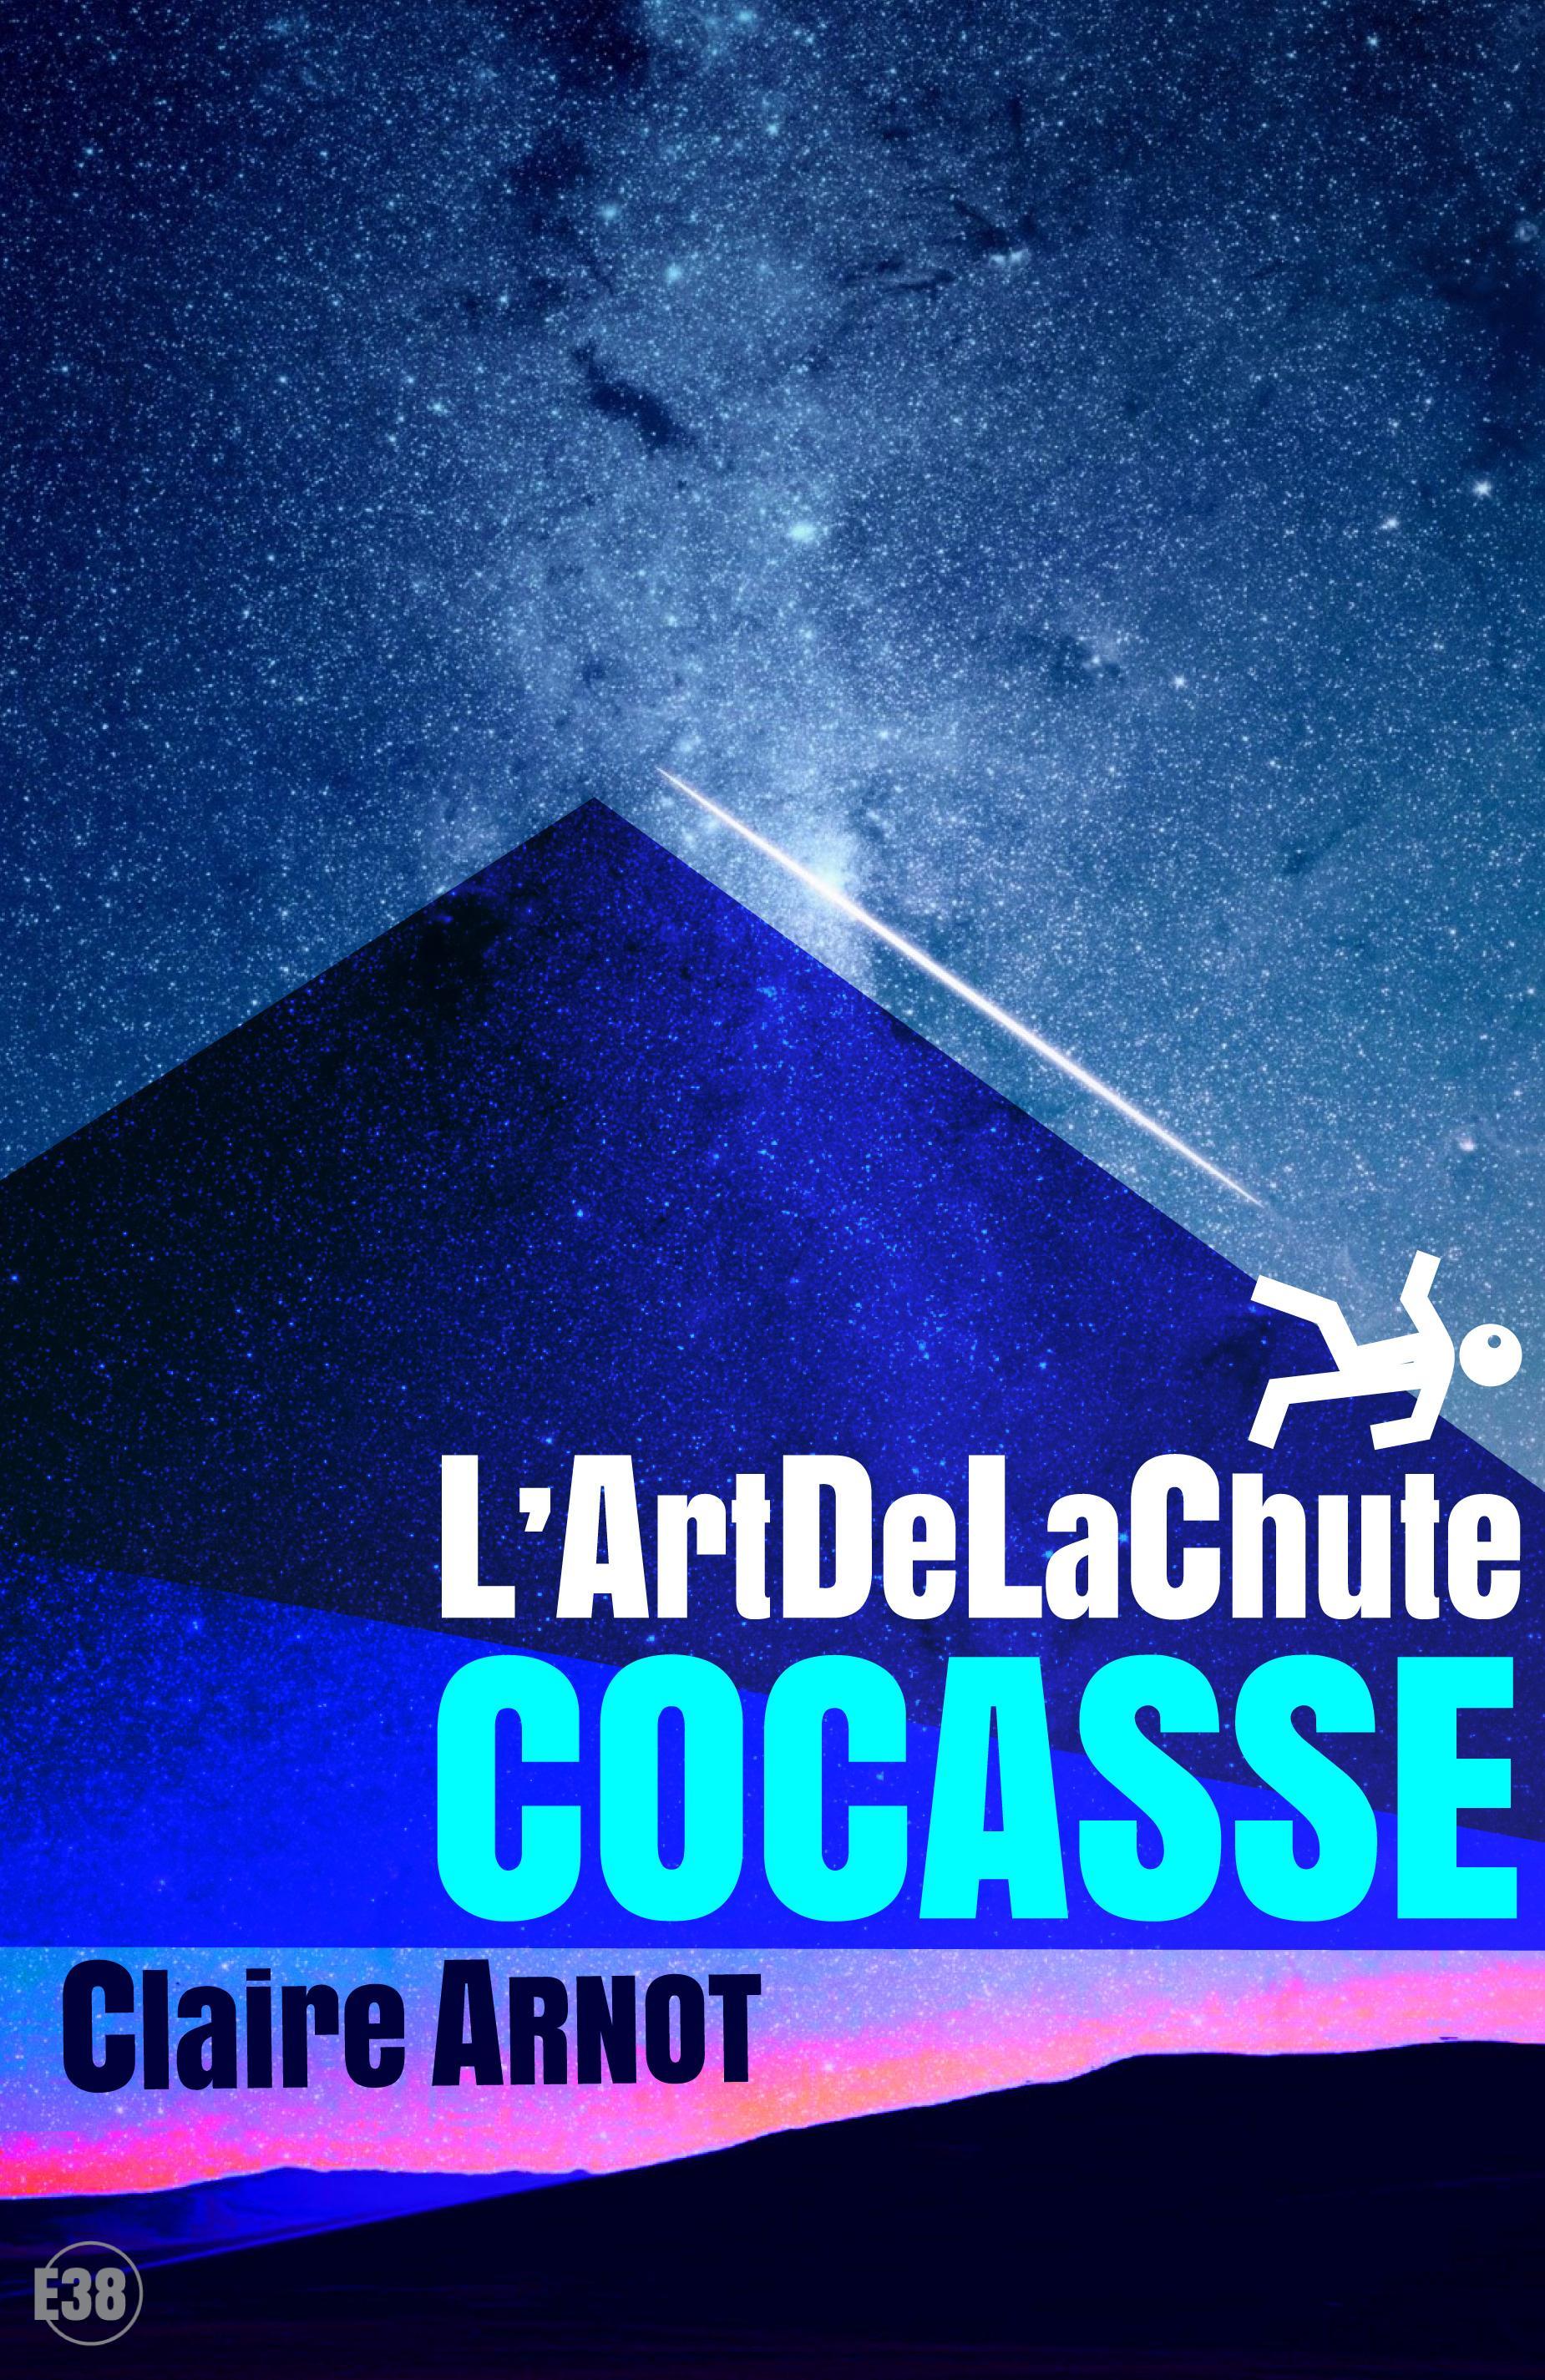 L'ArtDeLaChute Cocasse, VOLUME 2